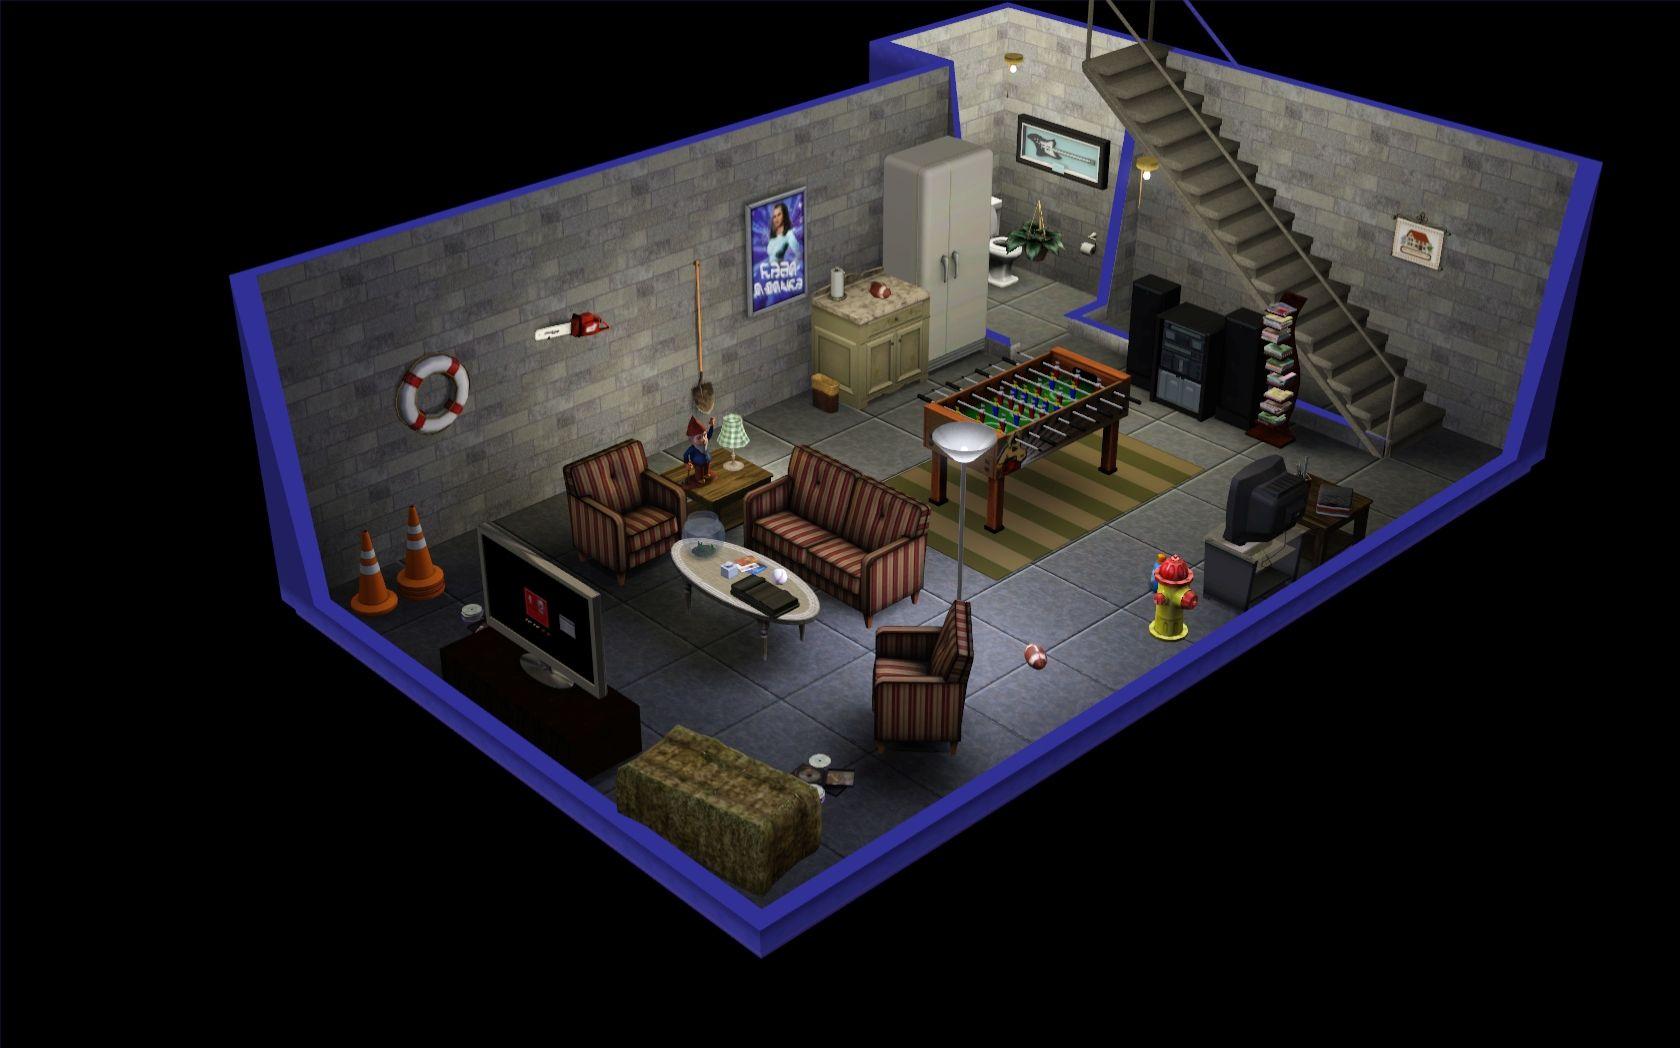 Sims 3 Man Cave Lol Sims 3 Rooms Man Cave Bathroom Man Cave Decor